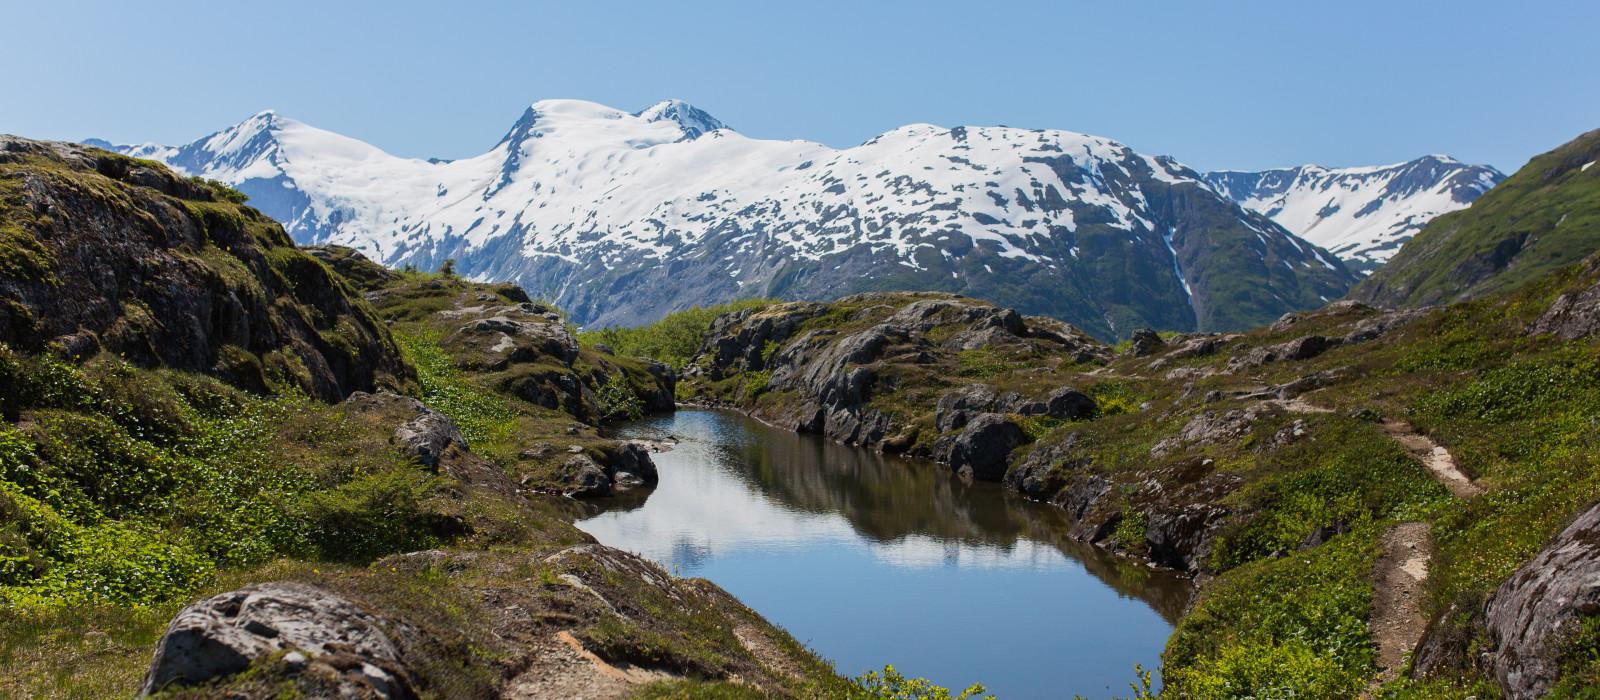 Reiseziel Whittier Alaska